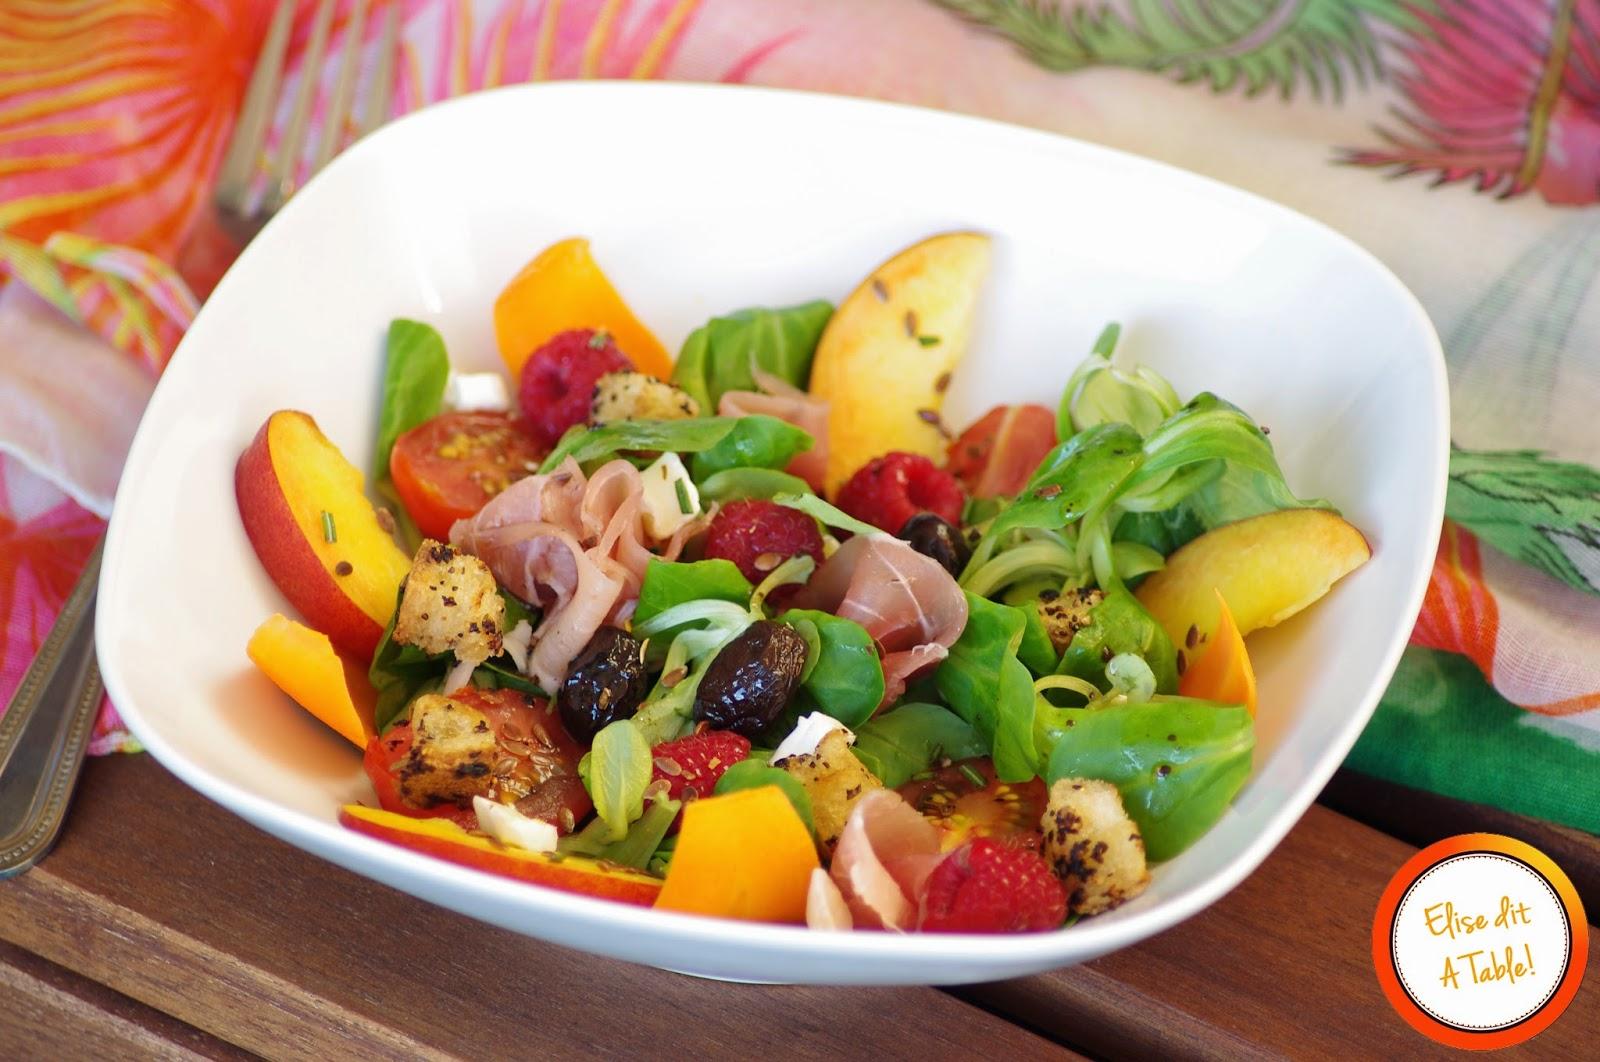 Recette salade fra cheur estivale blog cuisine for Entree estivale